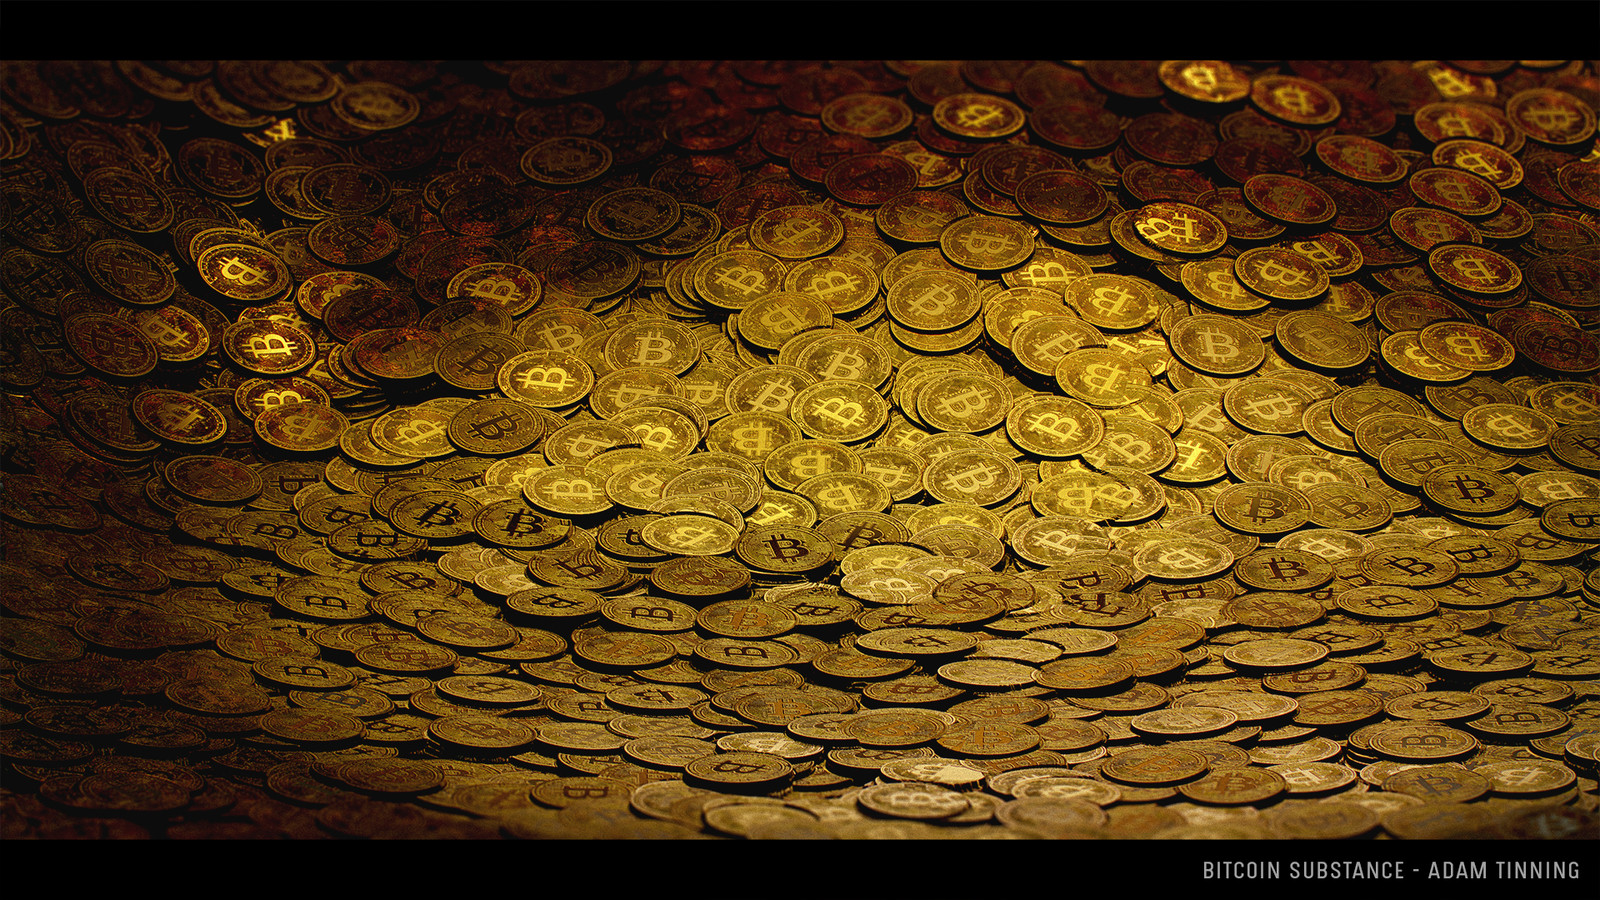 Bitcoin Substance